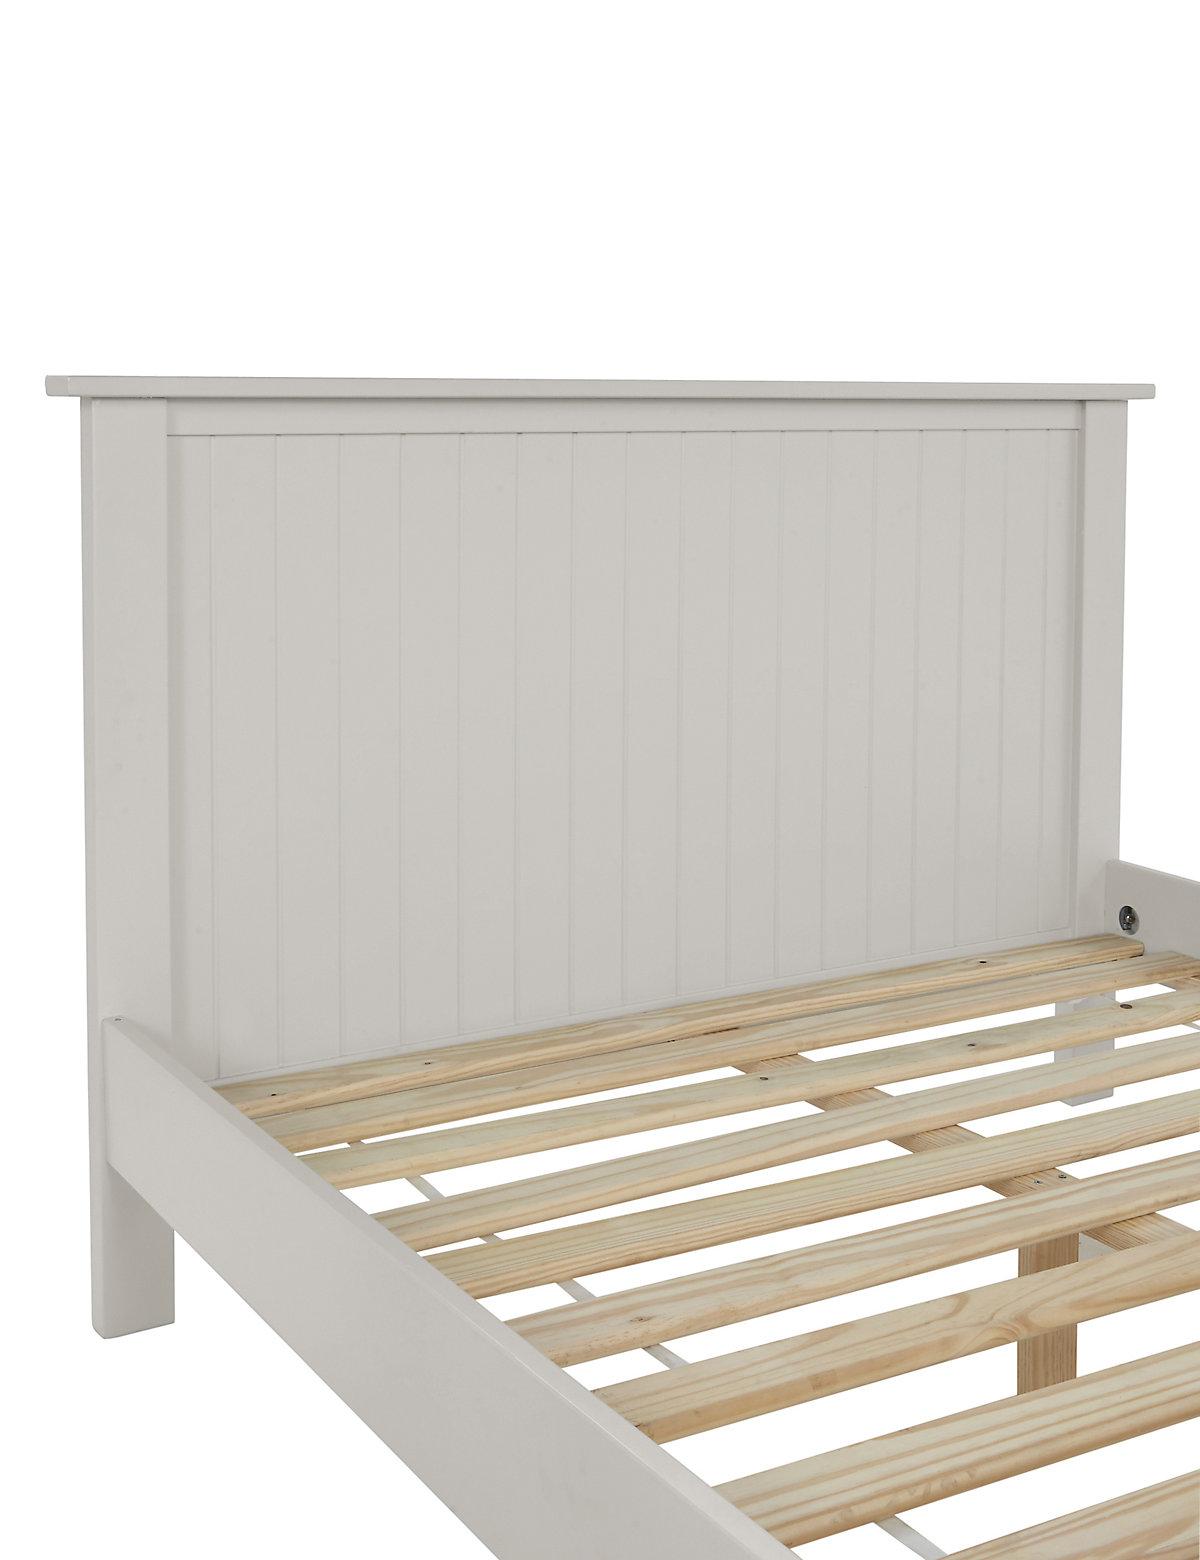 Marks and spencer dawson grey bed frame for Kids white bed frame